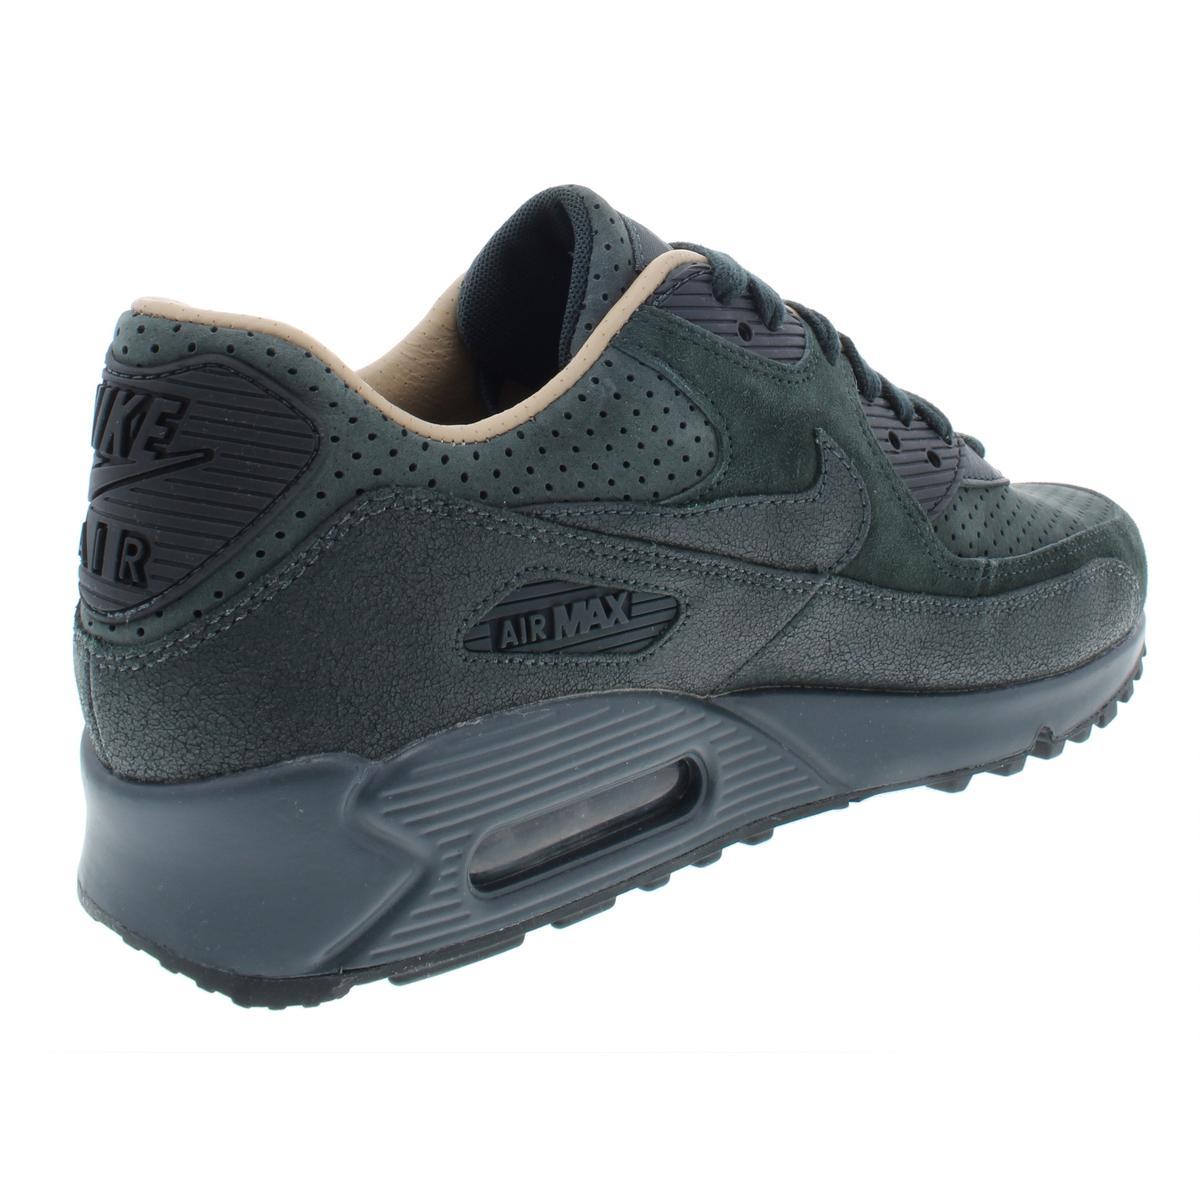 Nike-Womens-Air-Max-90-Pinnacle-Suede-Low-Top-Fashion-Sneakers-Shoes-BHFO-4140 thumbnail 10